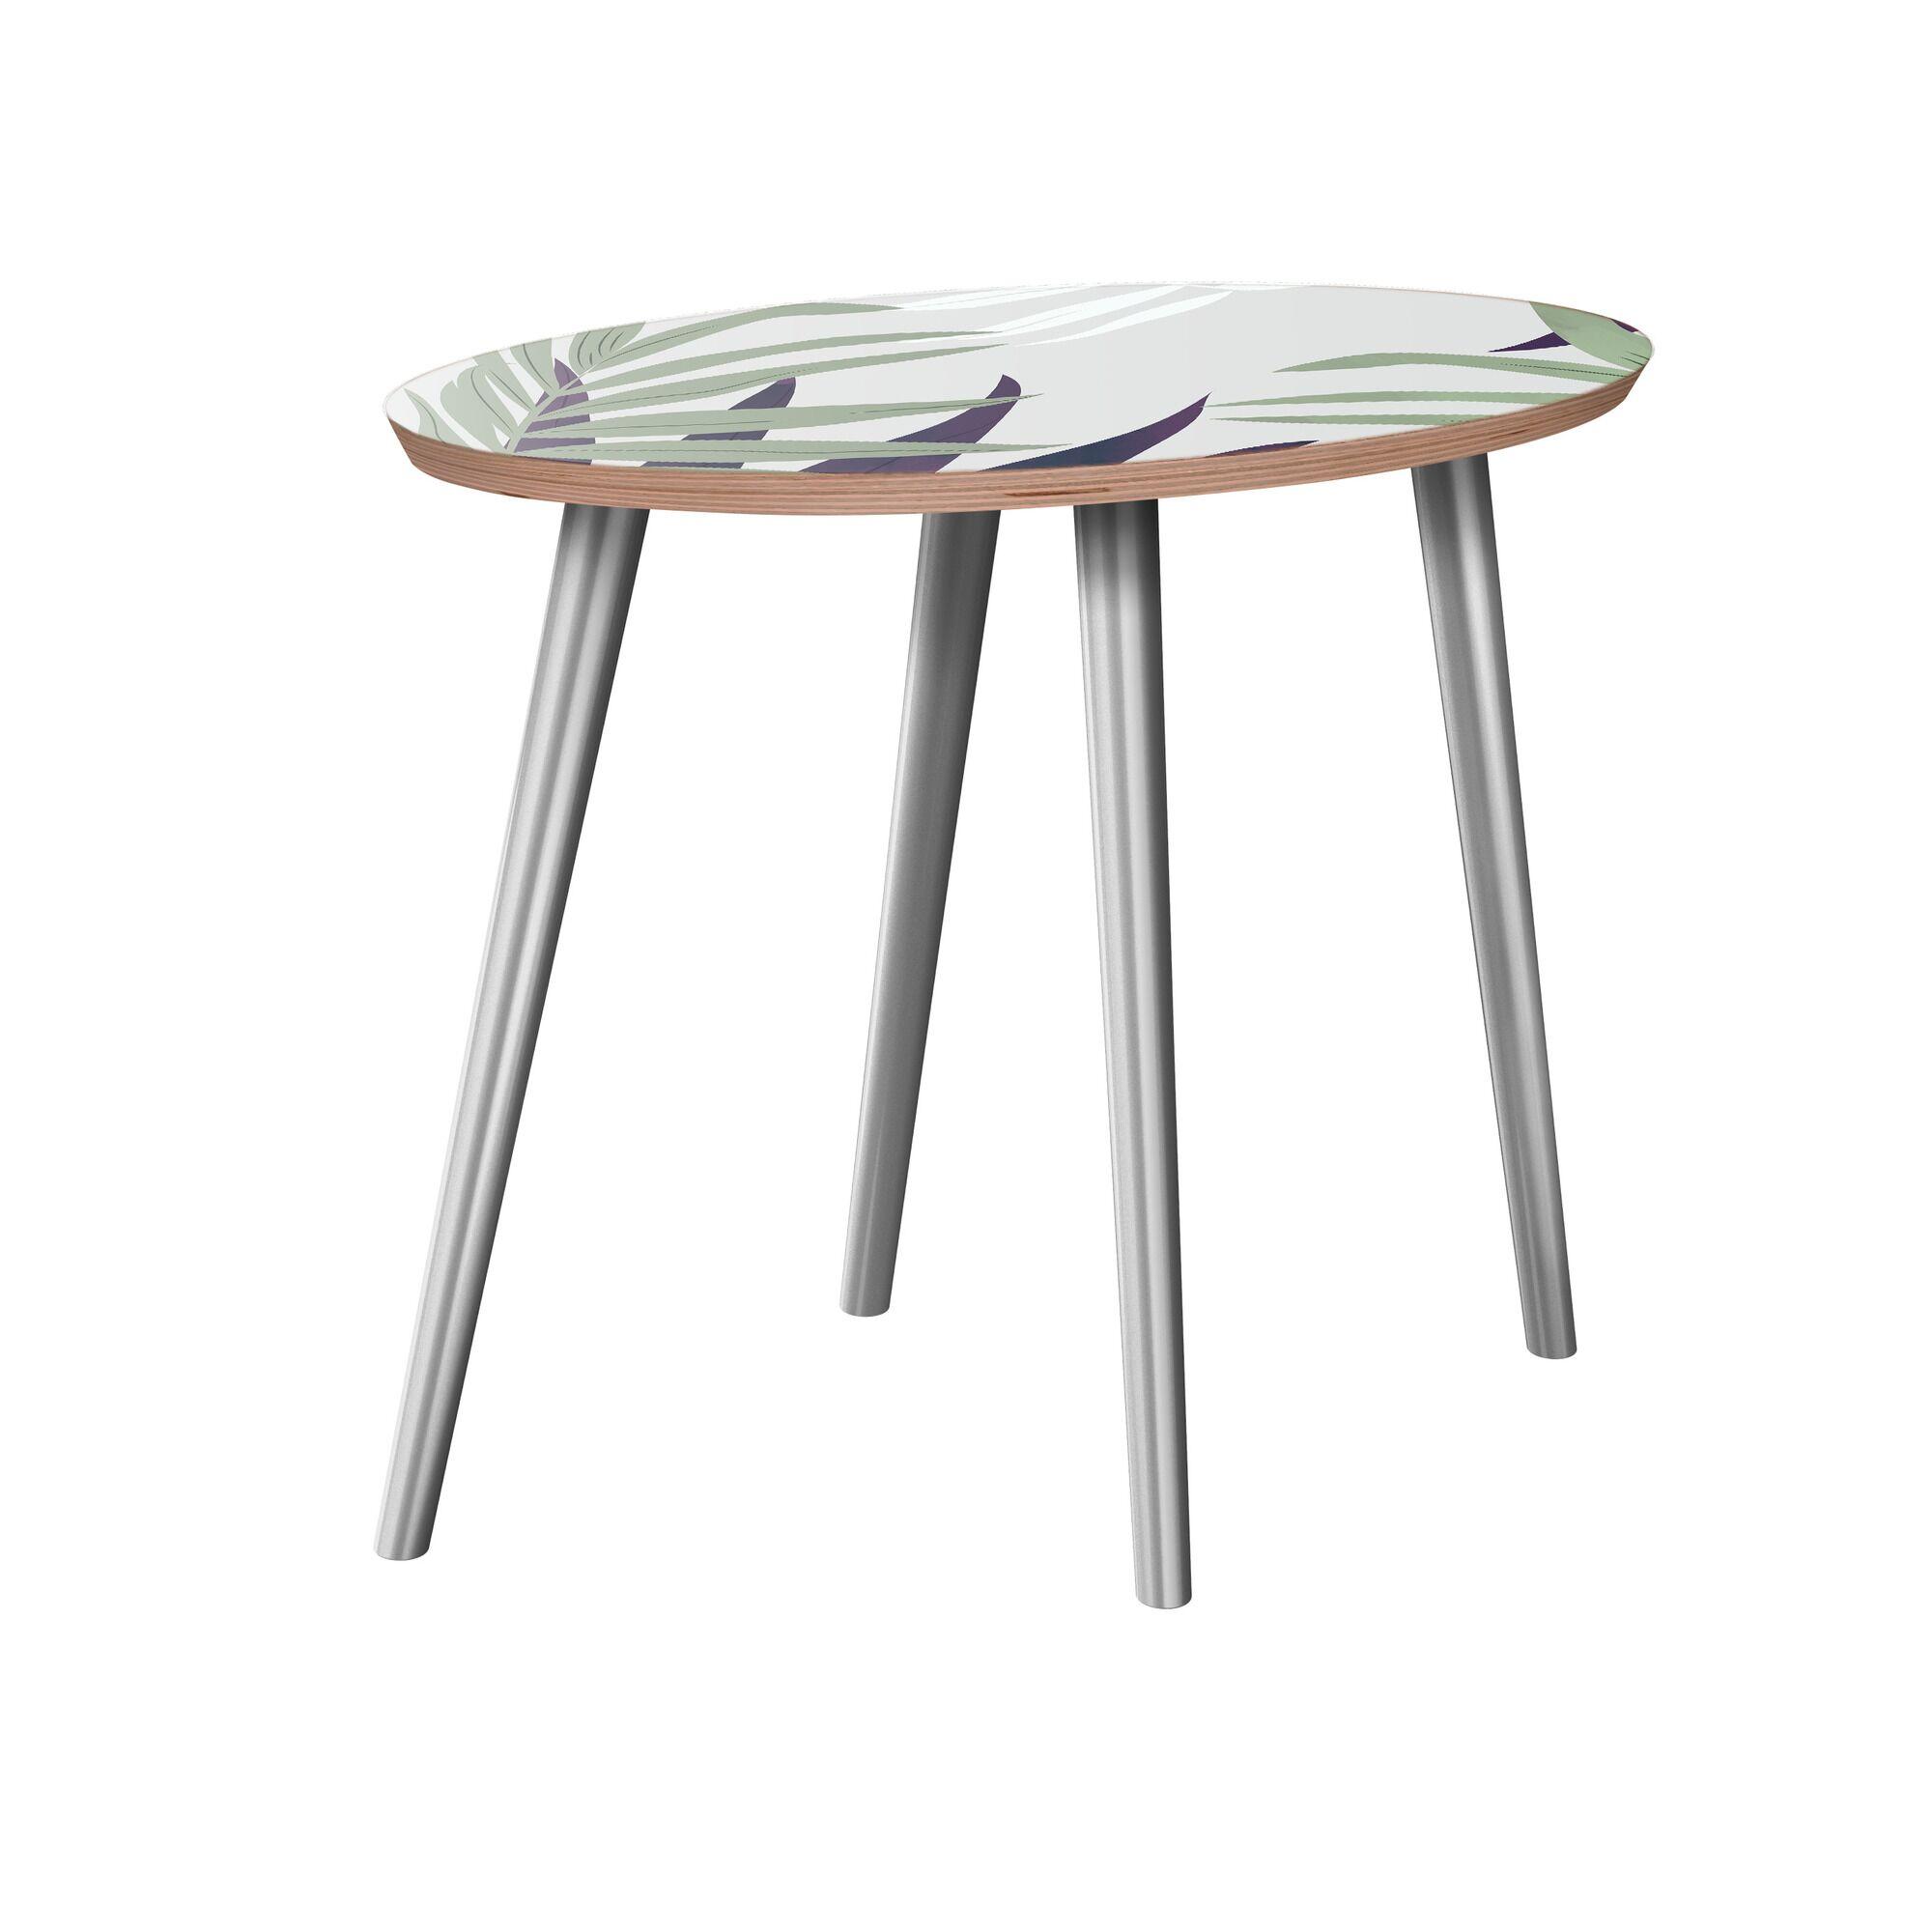 Koutio End Table Table Base Color: Chrome, Table Top Color: Walnut